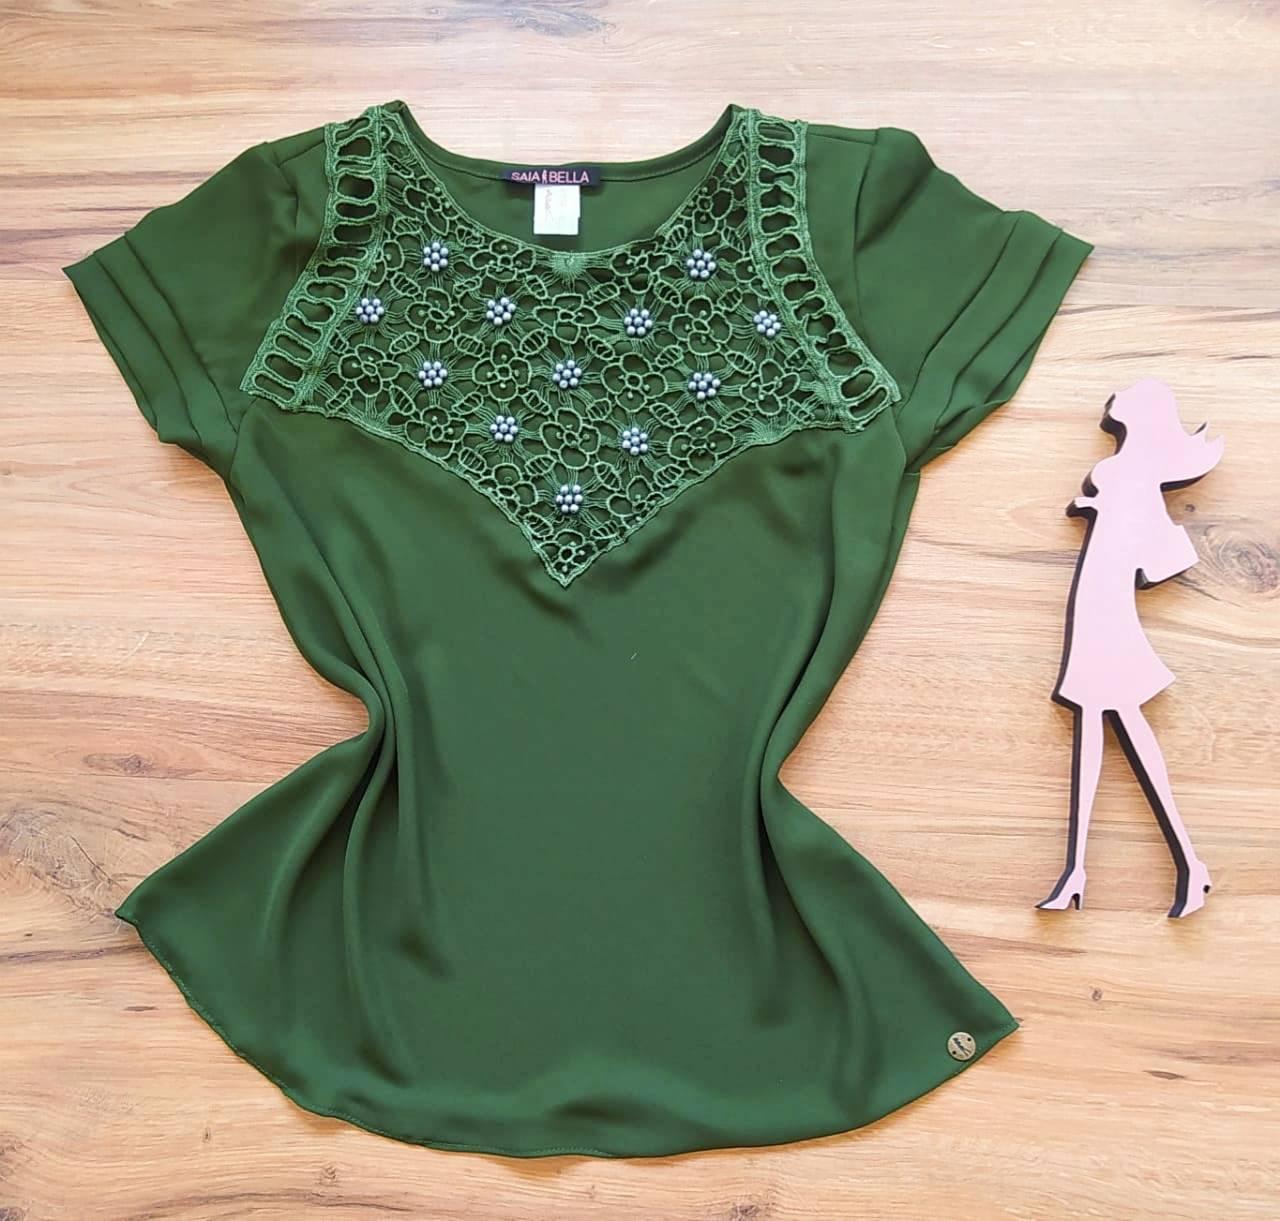 Blusa Valéria de Renda Saia Bella - SB79903 verde